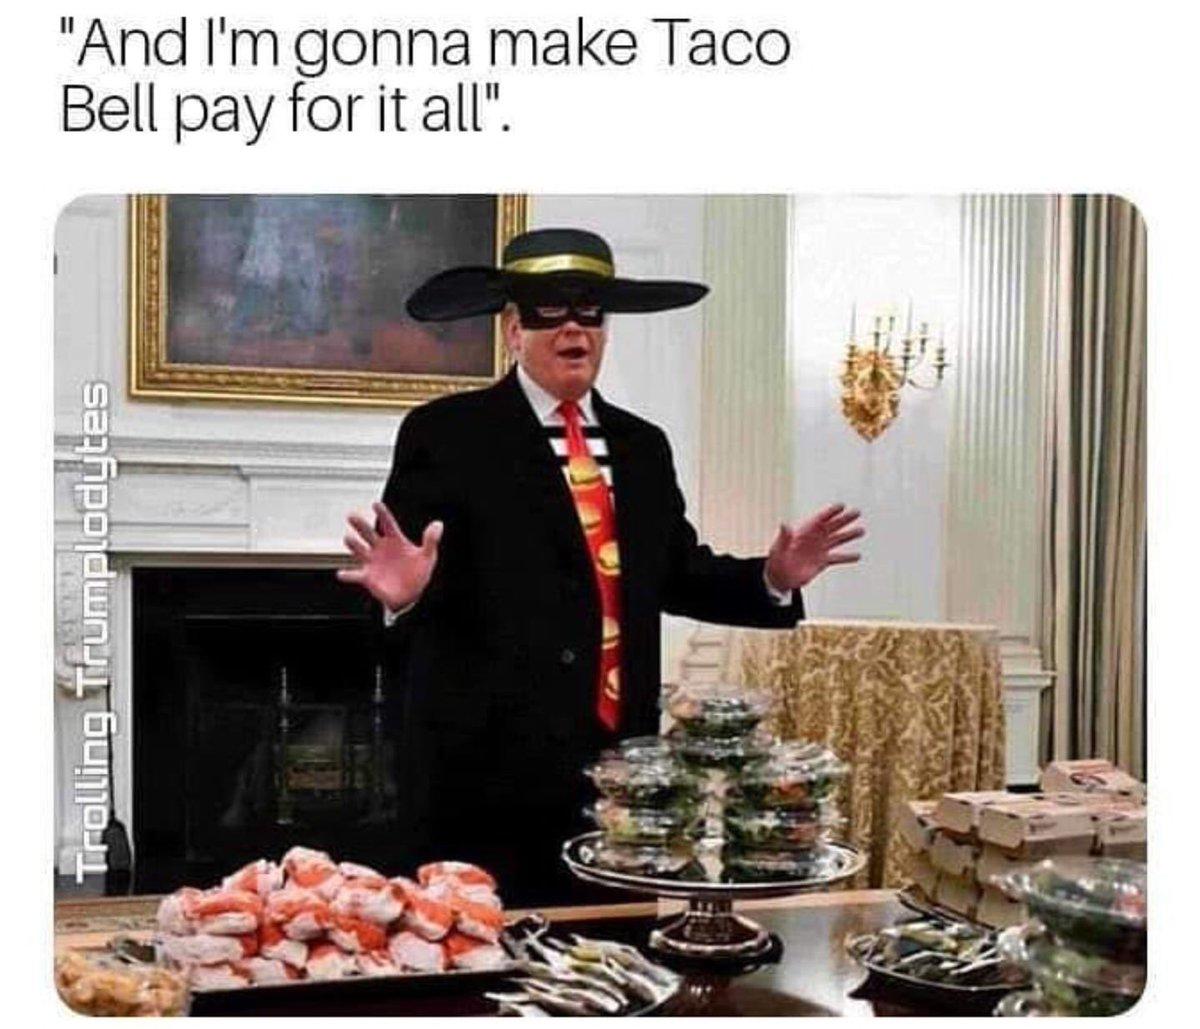 #WhiteHouseDinner #Clemson #TacoBell #BurgerKing #Pizza #Mcdonalds #FootBall #Champions #GovernmentShutDown #CheapPop #CheapPops #Memes